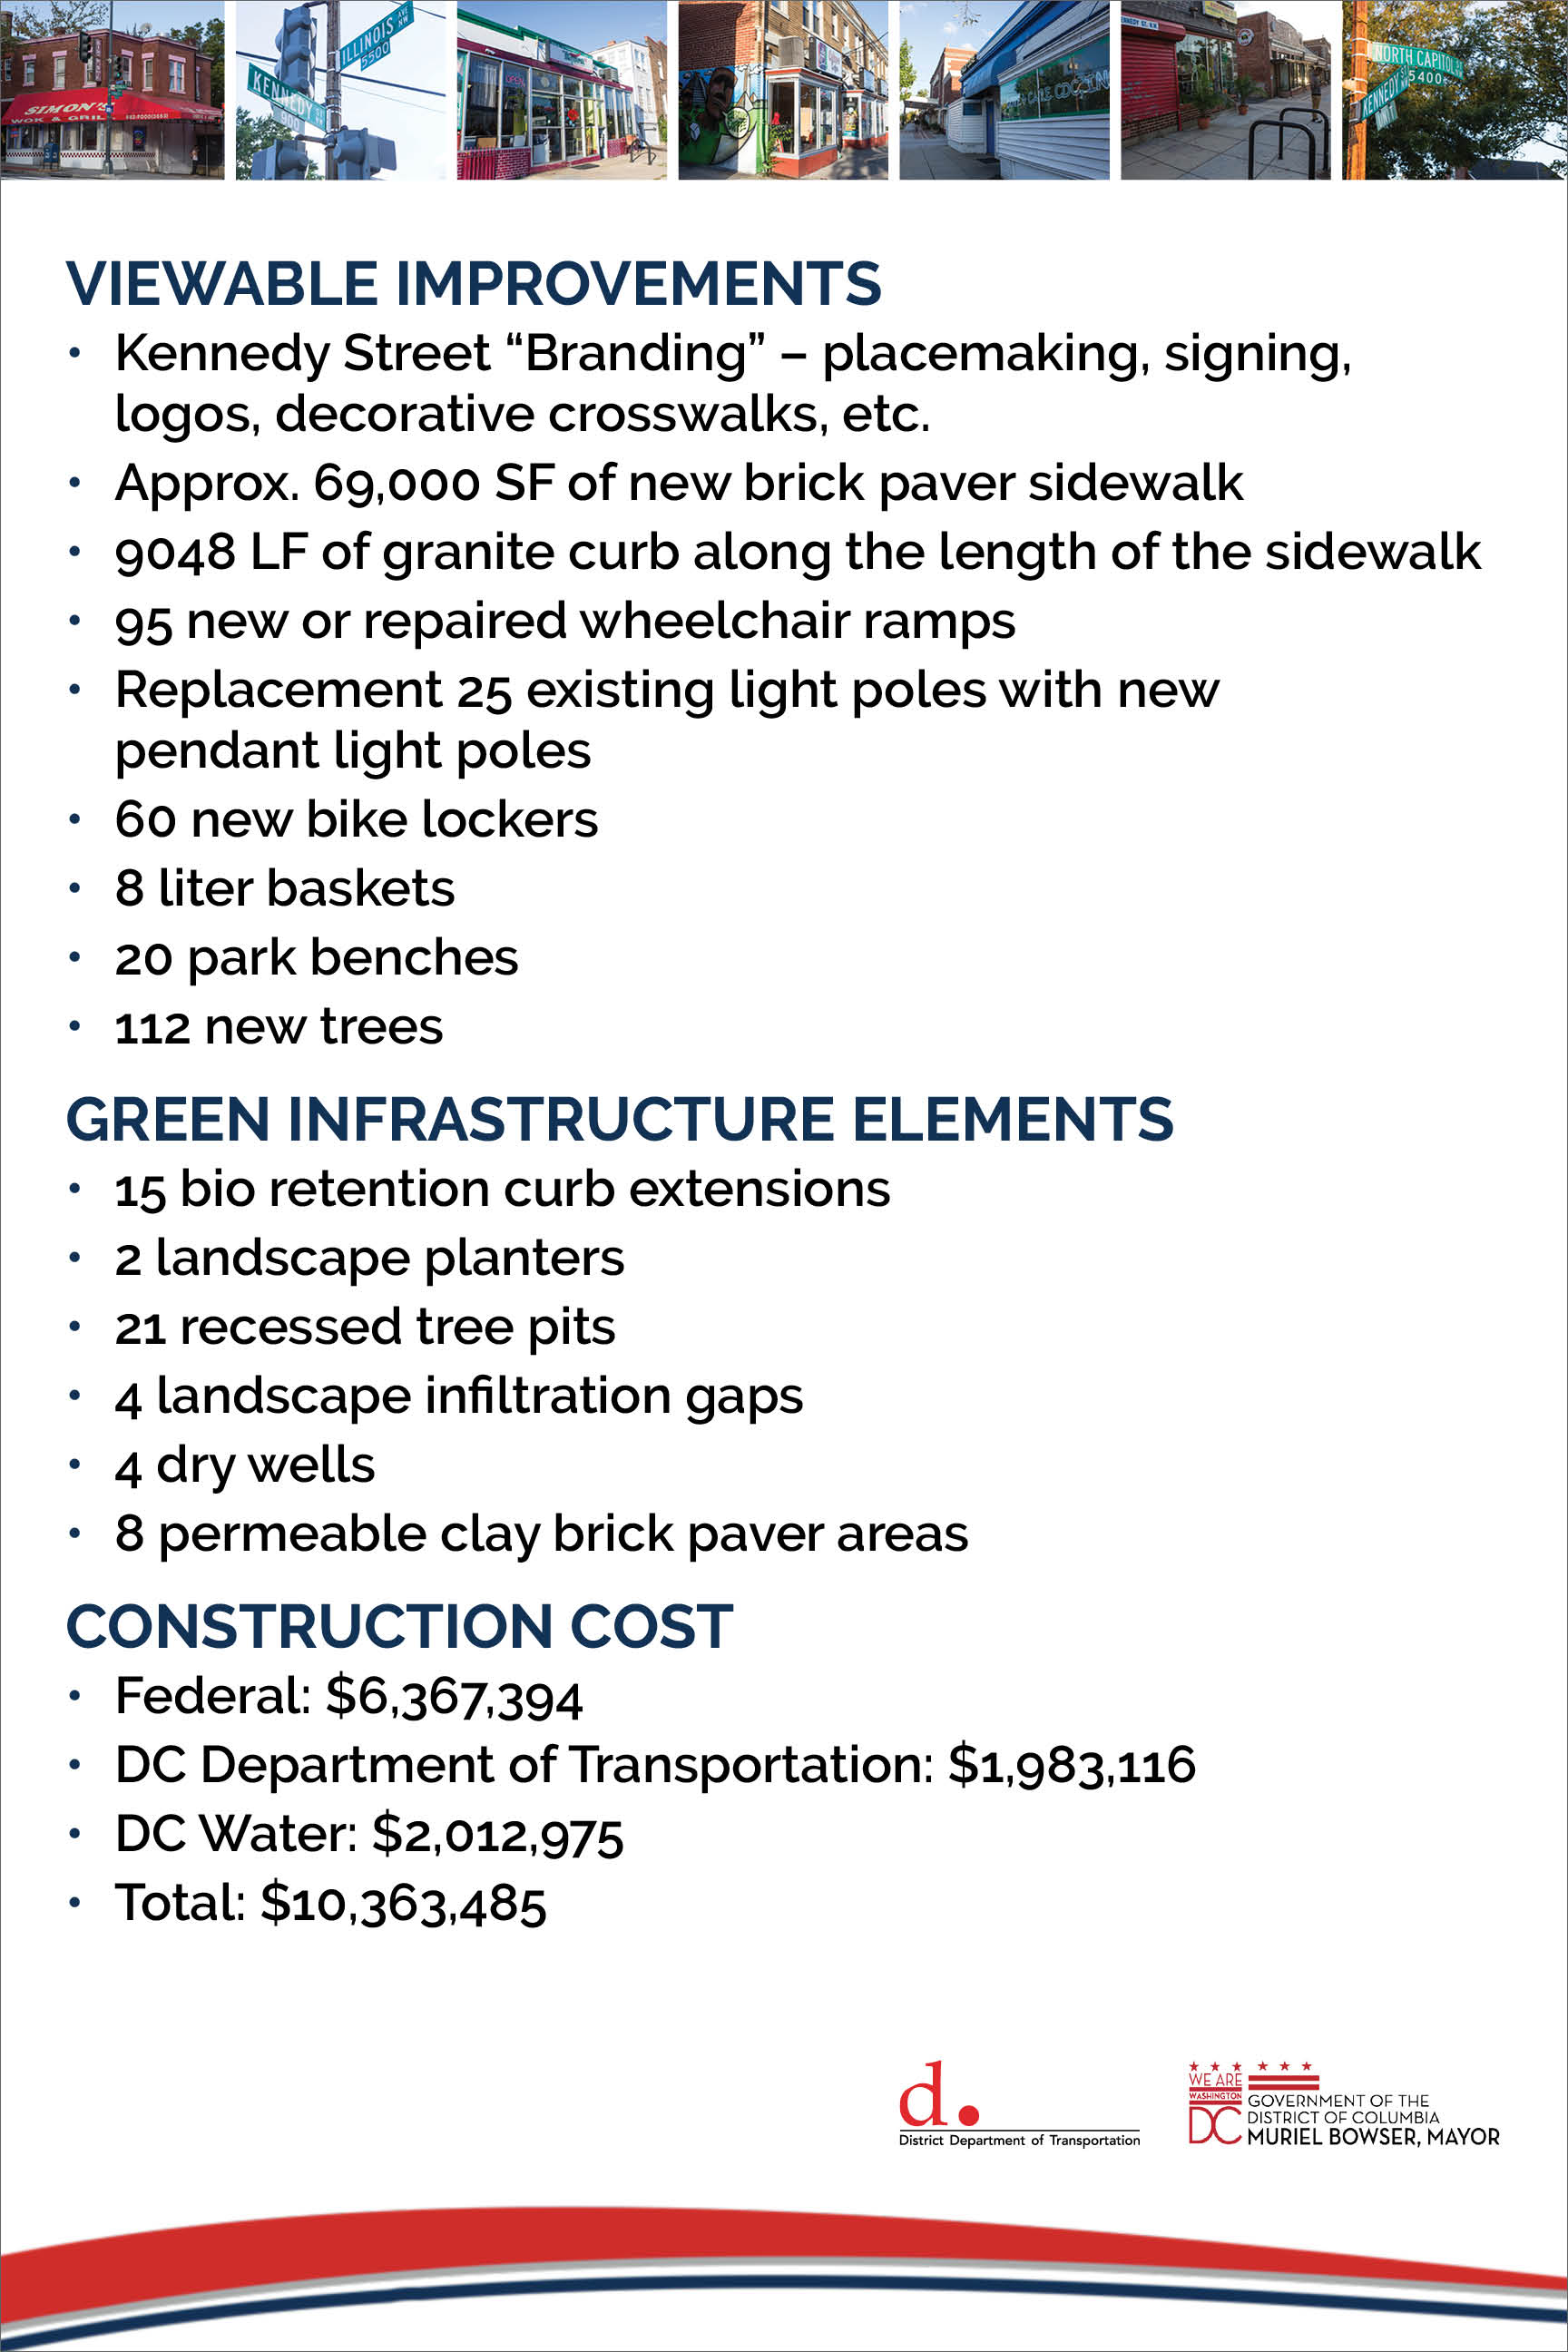 Viewable Improvements, Green Infrastructure Elements, Construction Cost